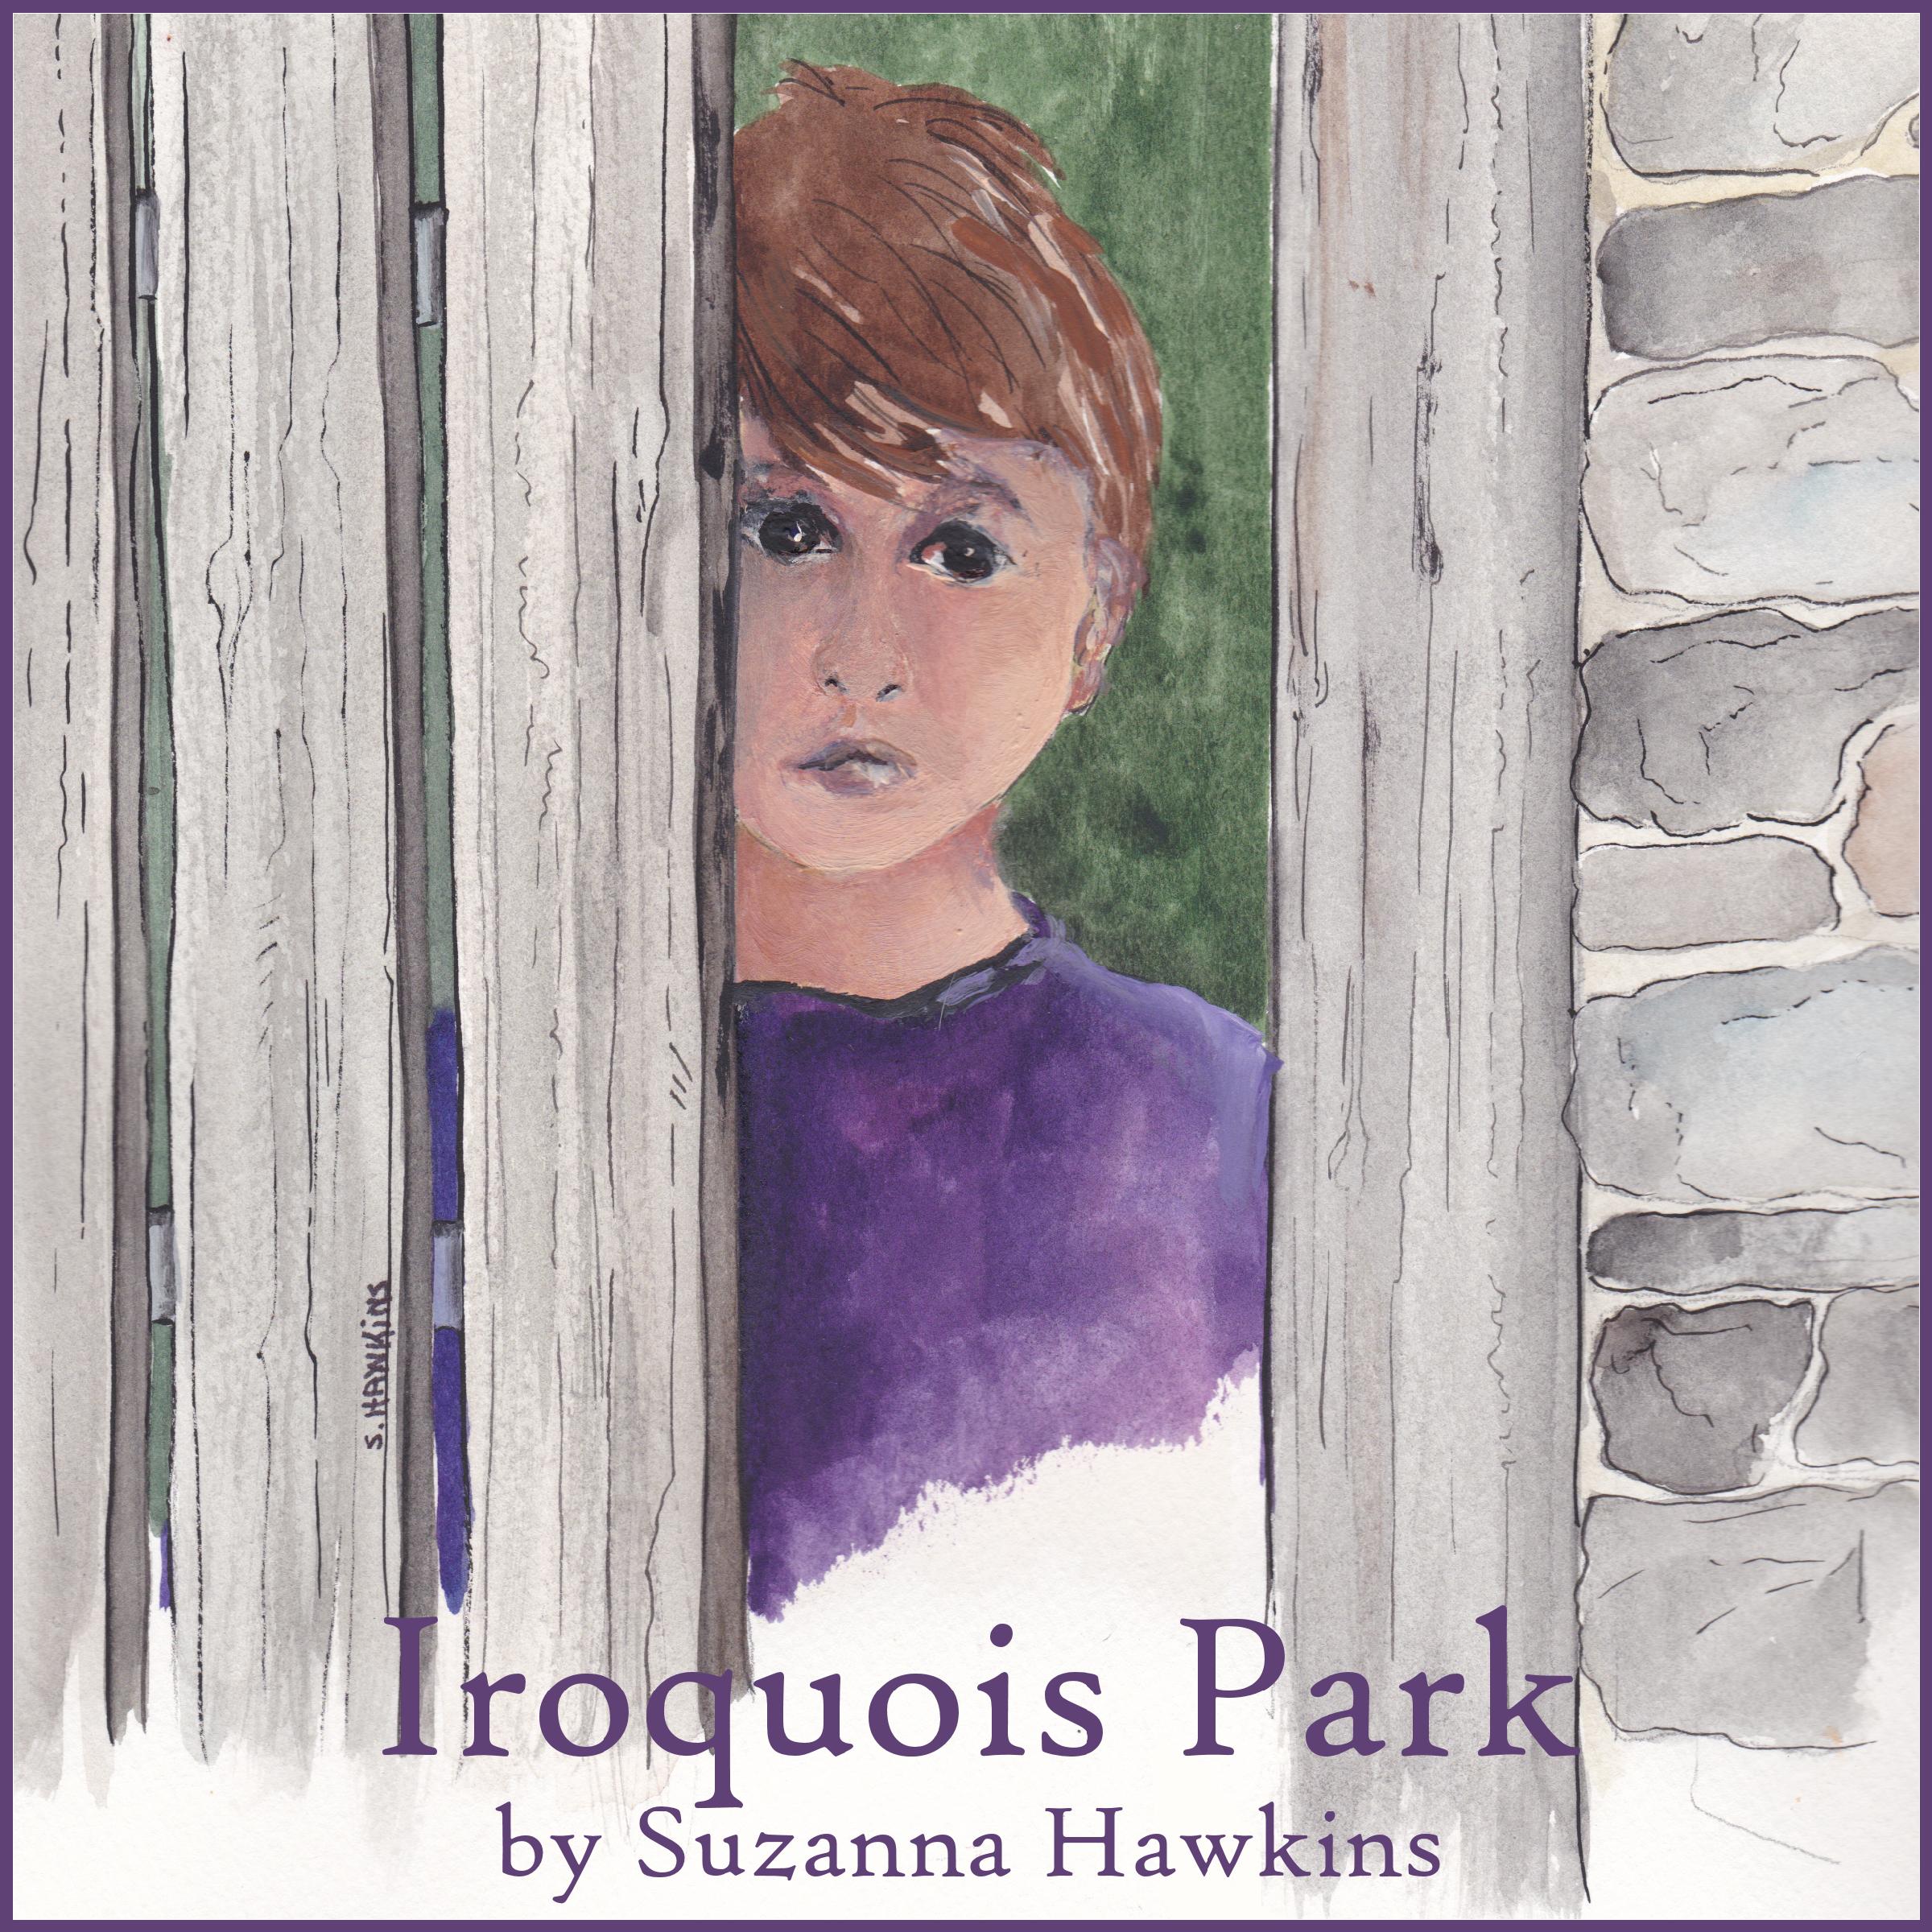 Iroquois Park, Suzanna Hawkins Author, Cheri Gardner Narrator